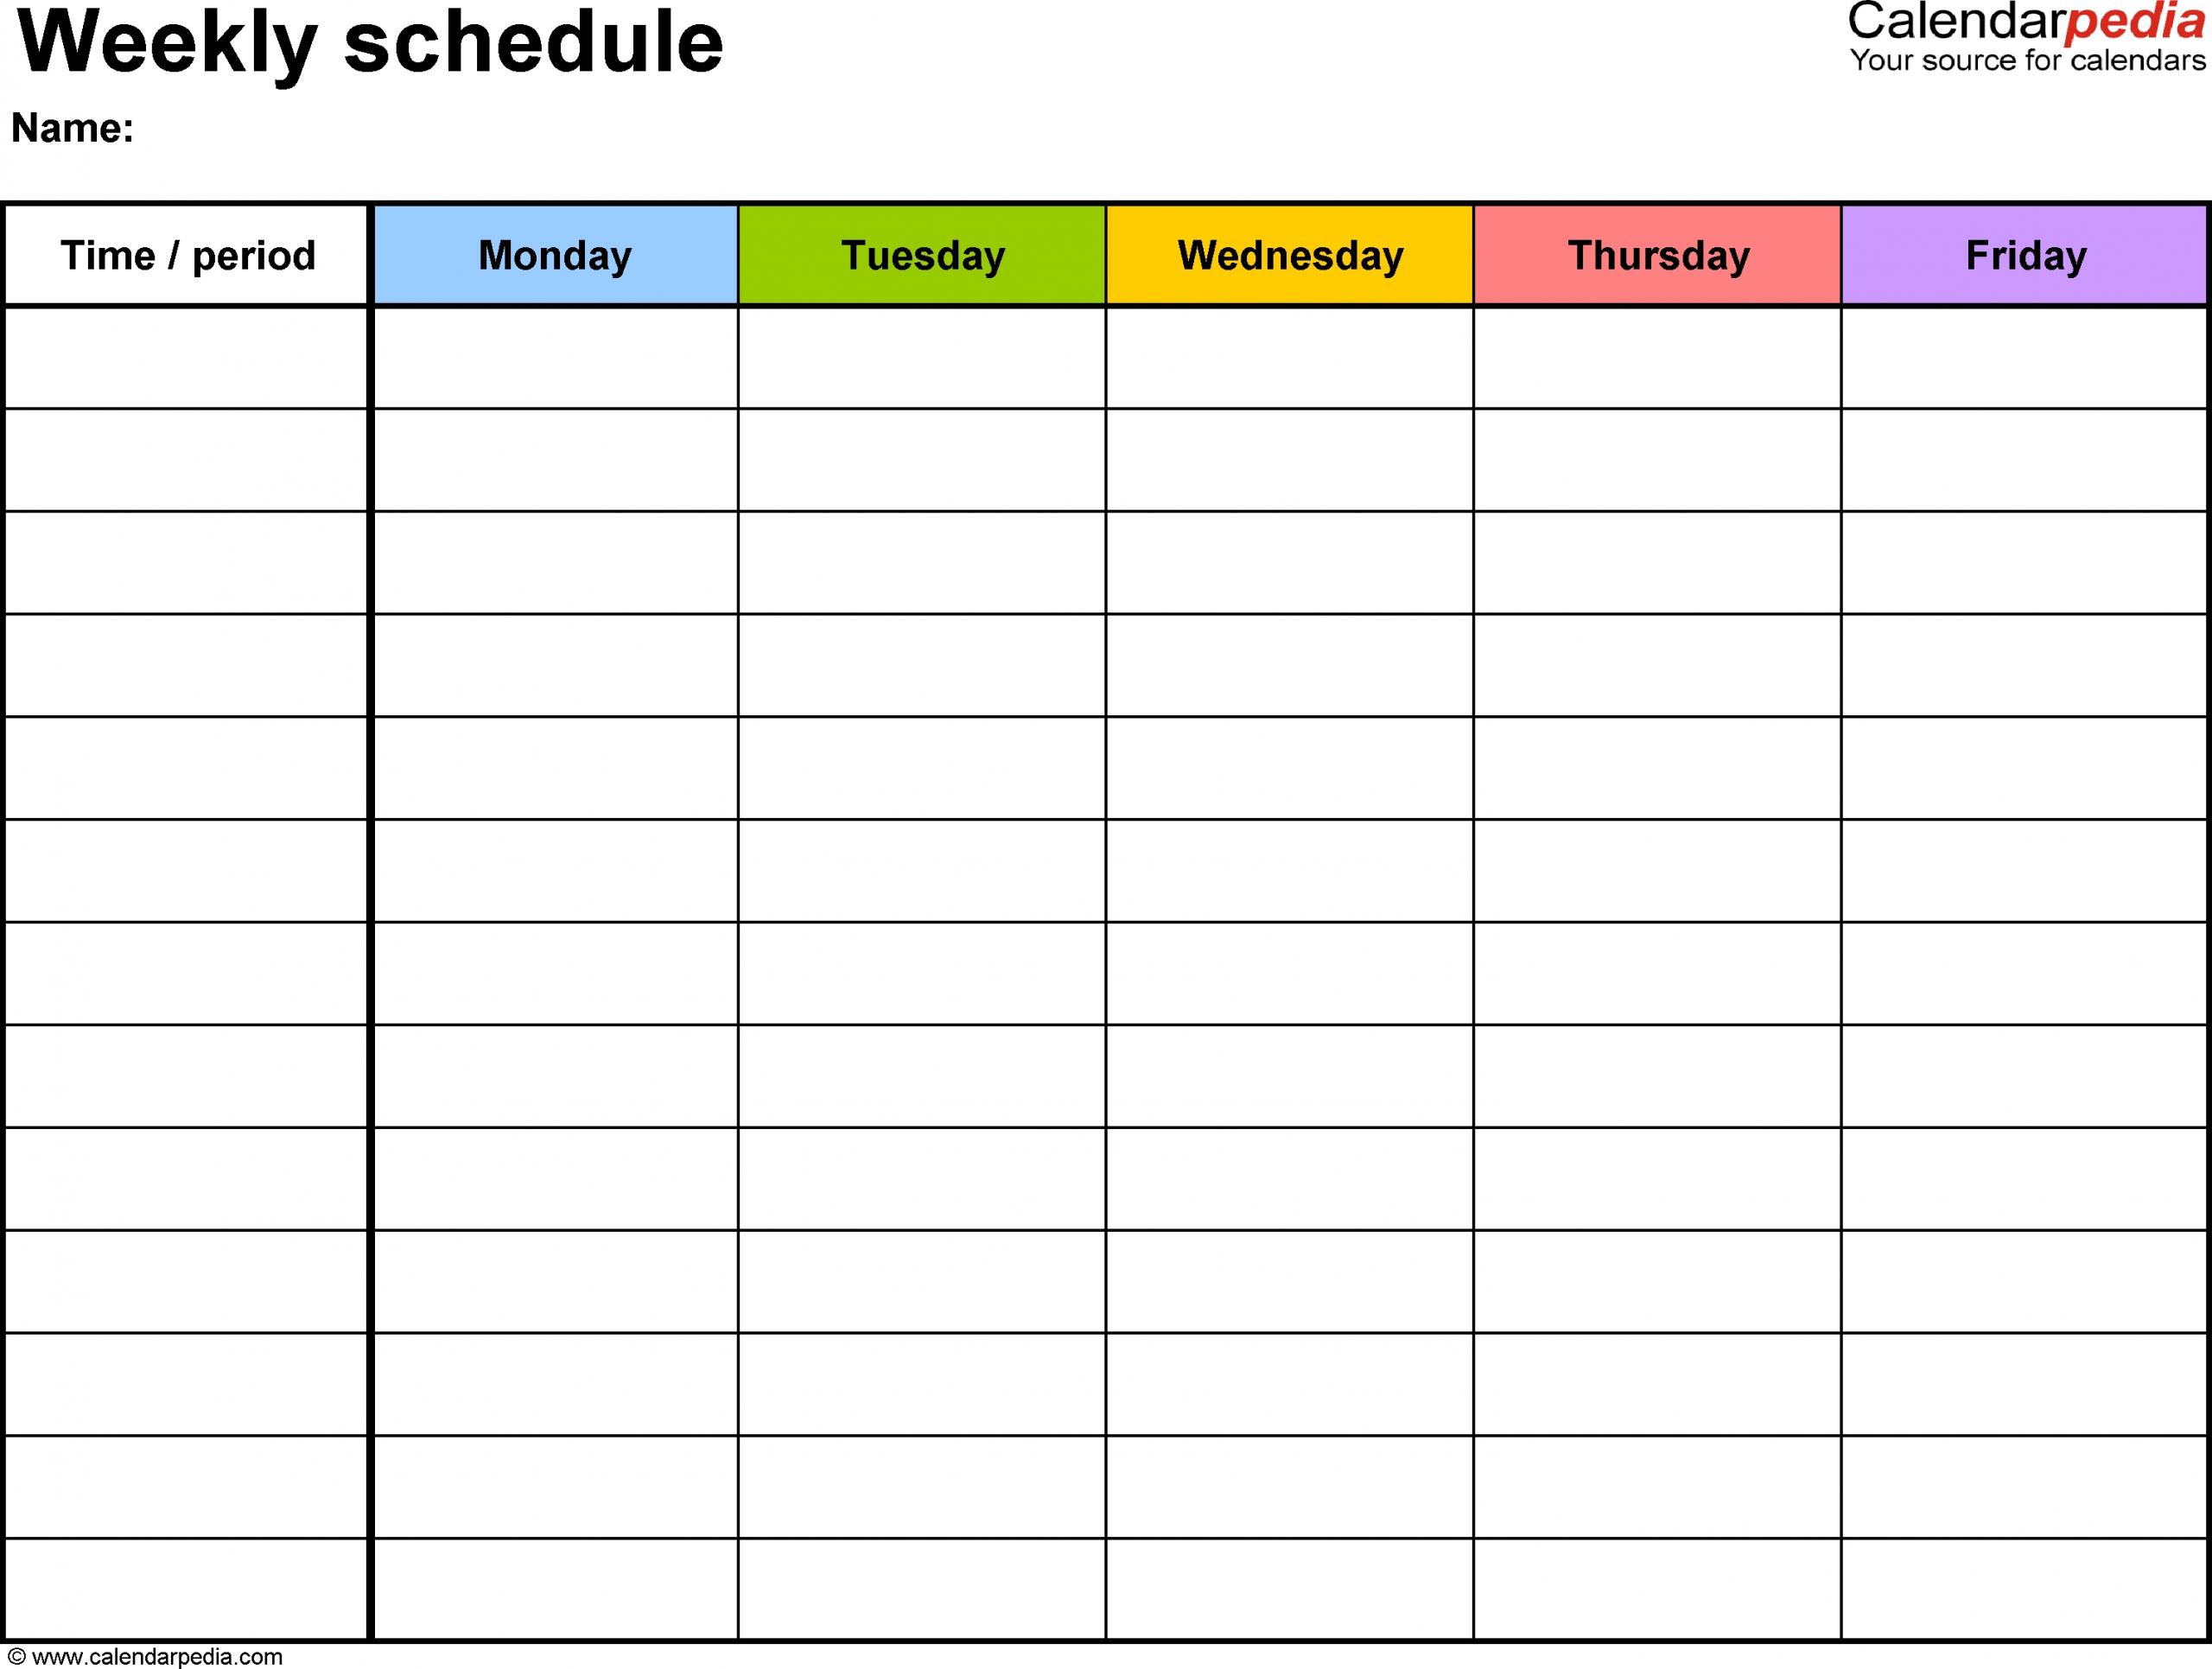 Blank Lined Weekly Printable Calendar - Calendar Blank Lined Calander Templates